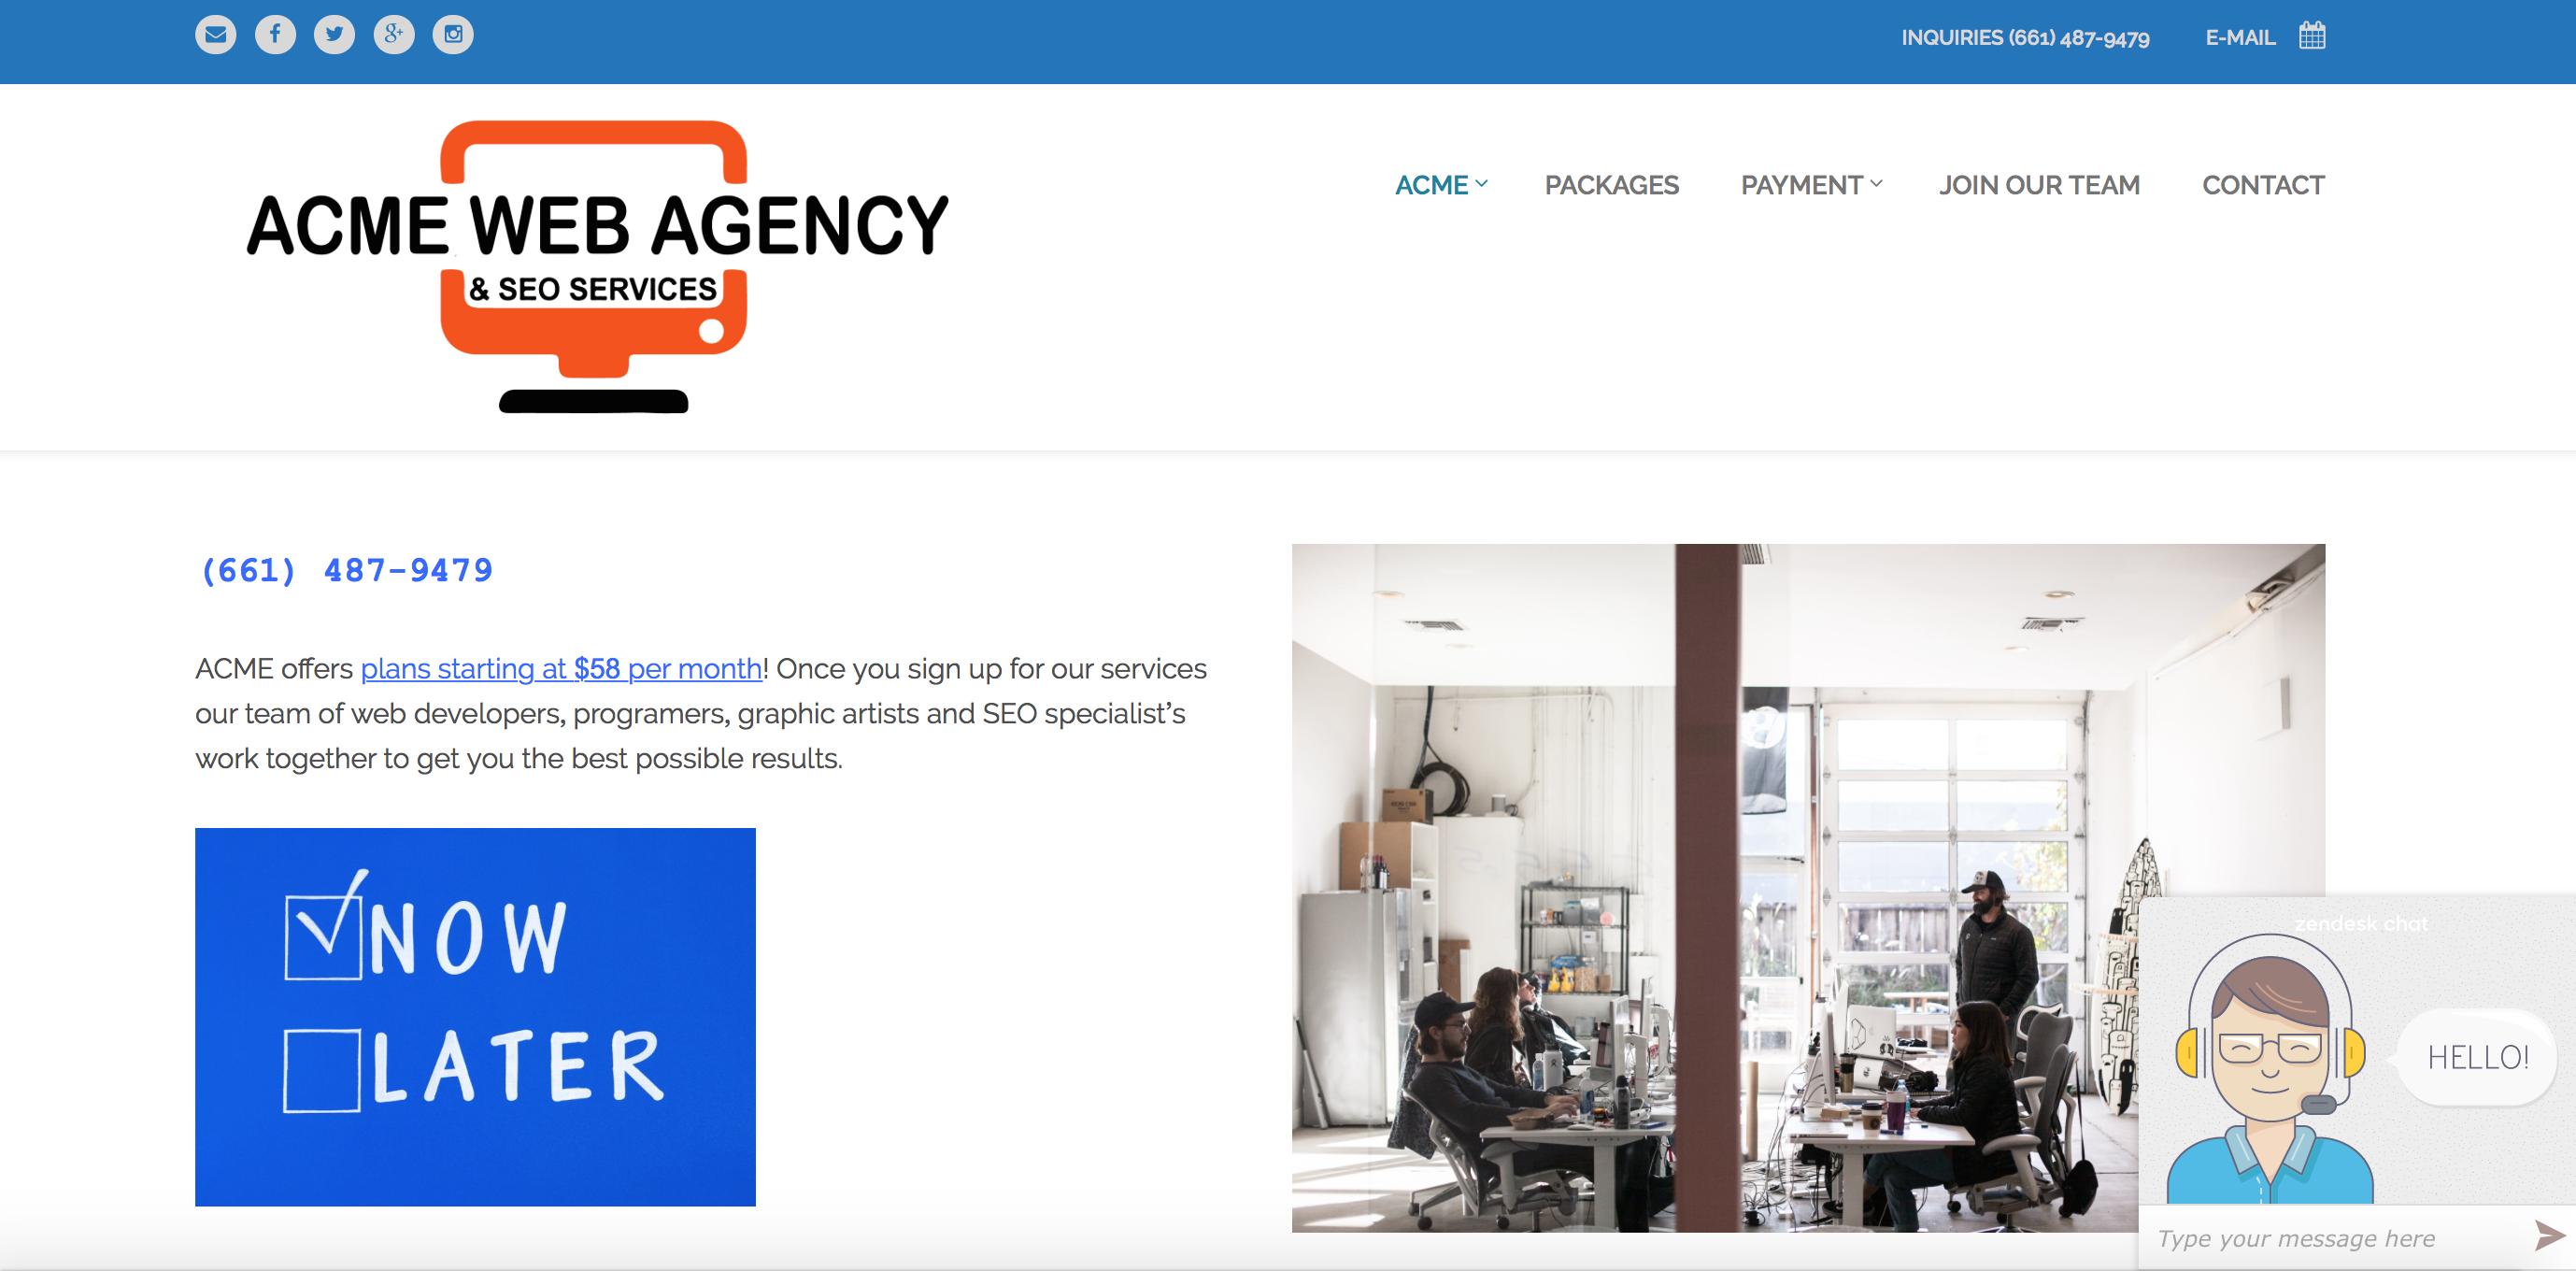 Bakersfield SEO Company, Marketing Agency Bakersfield, Acme Web Agency